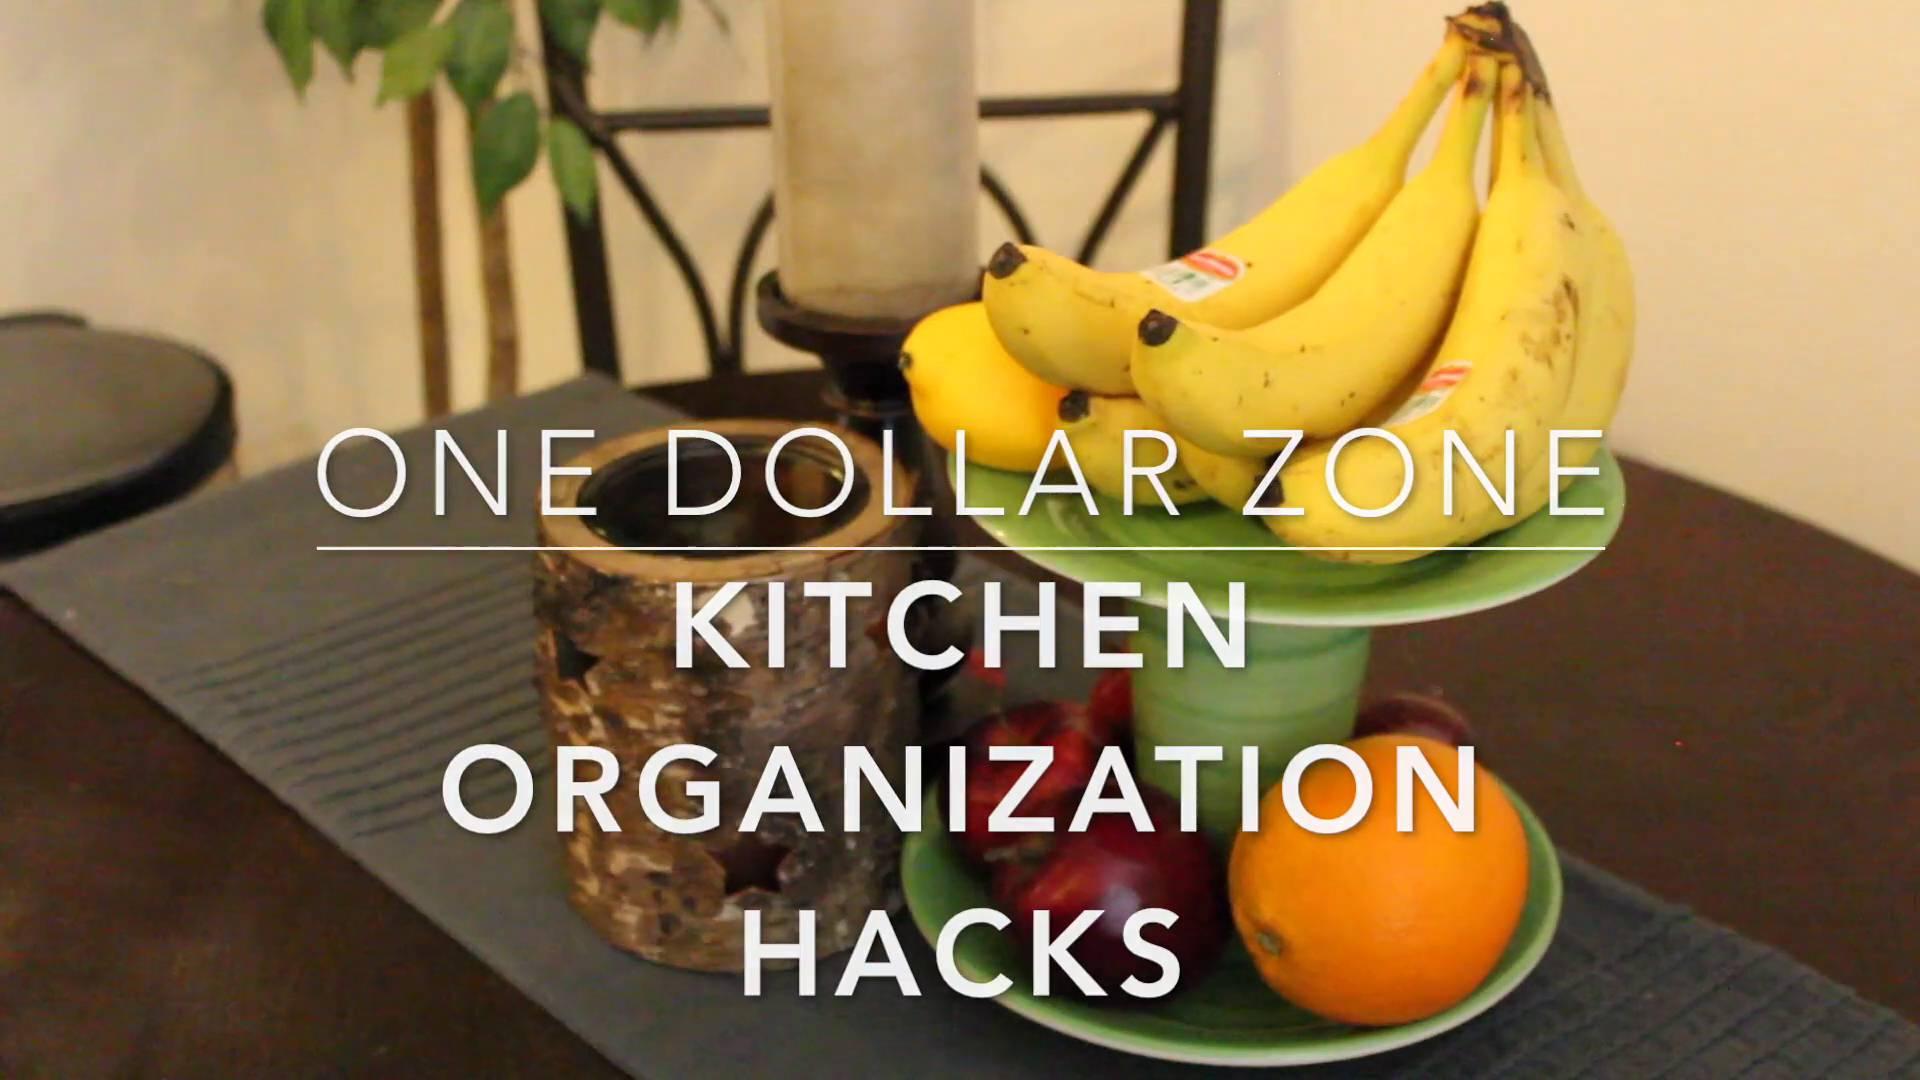 Fullsize Of One Dollar Zone